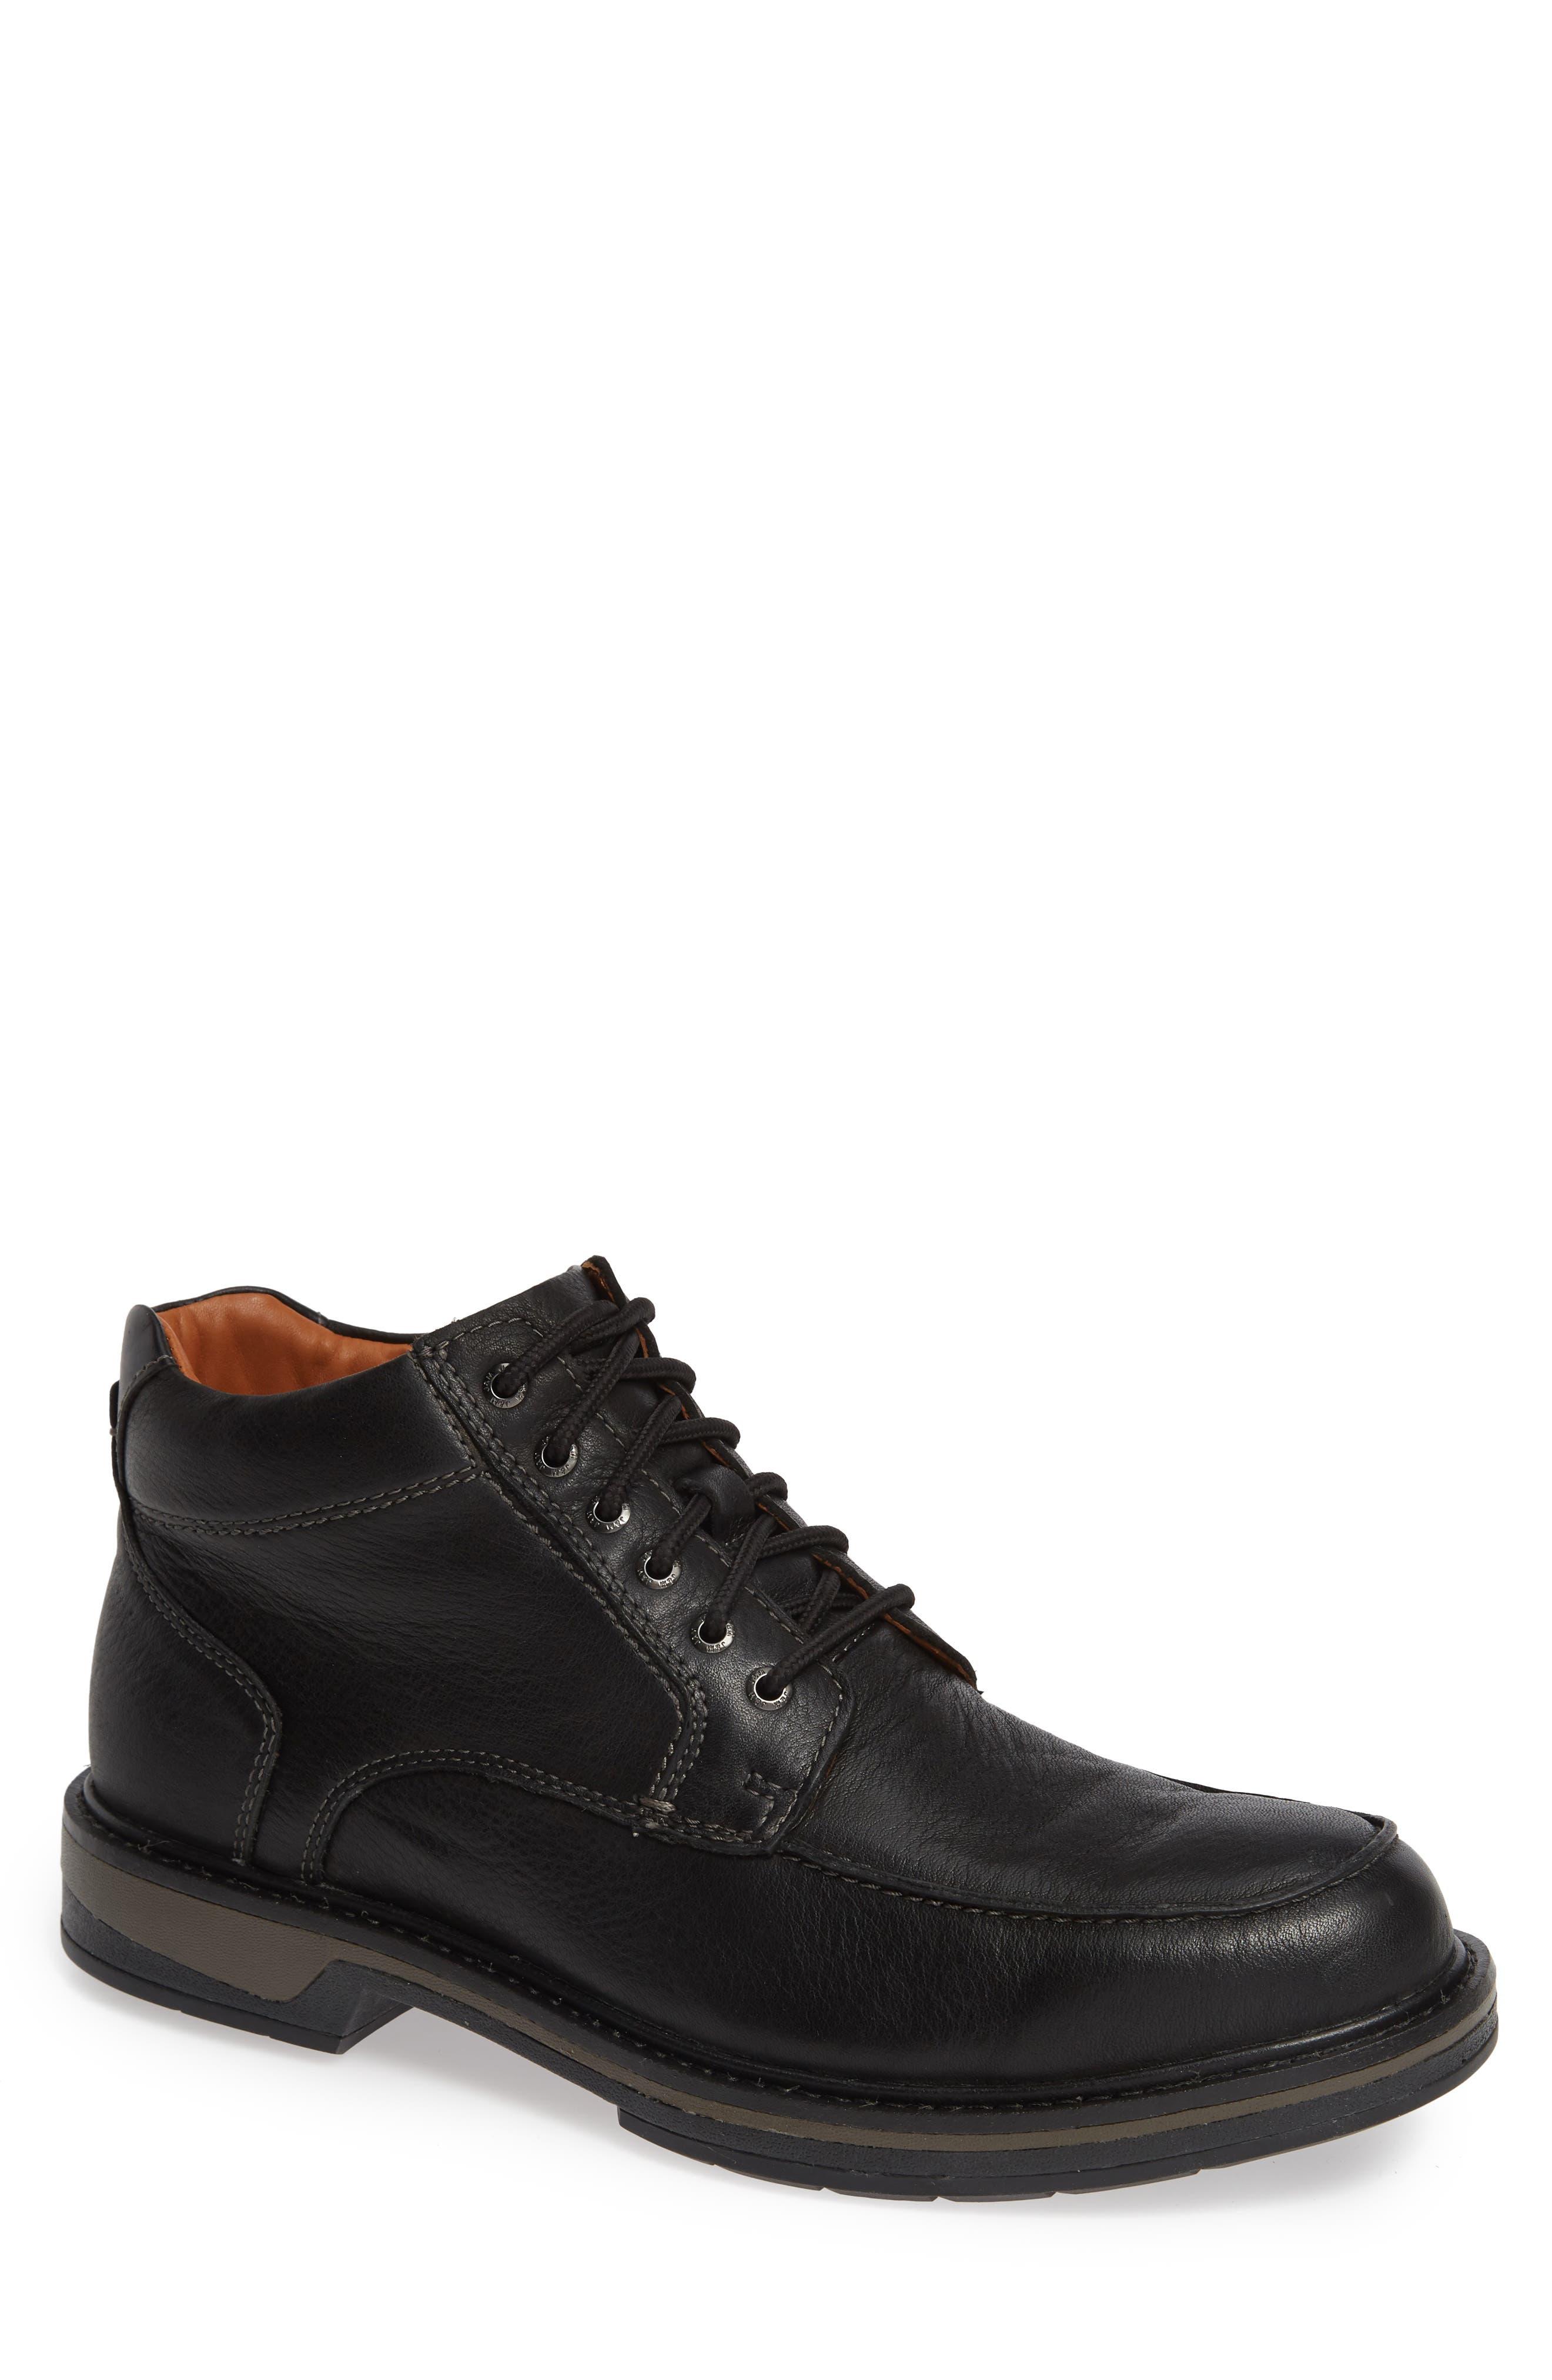 Johnston & Murphy Rutledge Waterproof Moc Toe Boot- Black